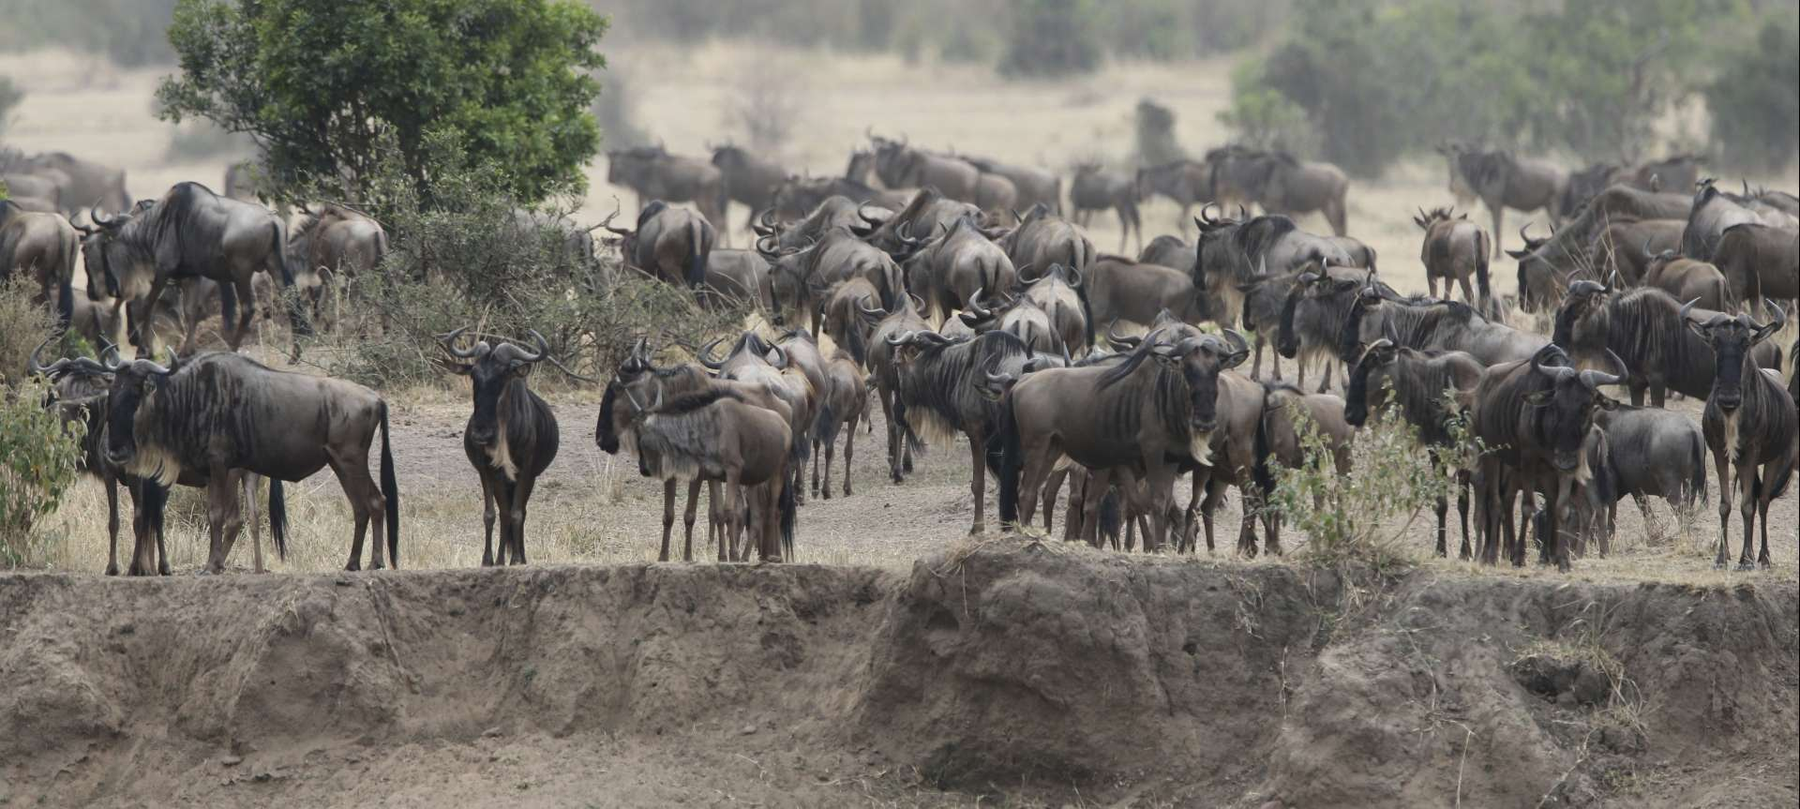 Migration_Kenya_Masai Mara